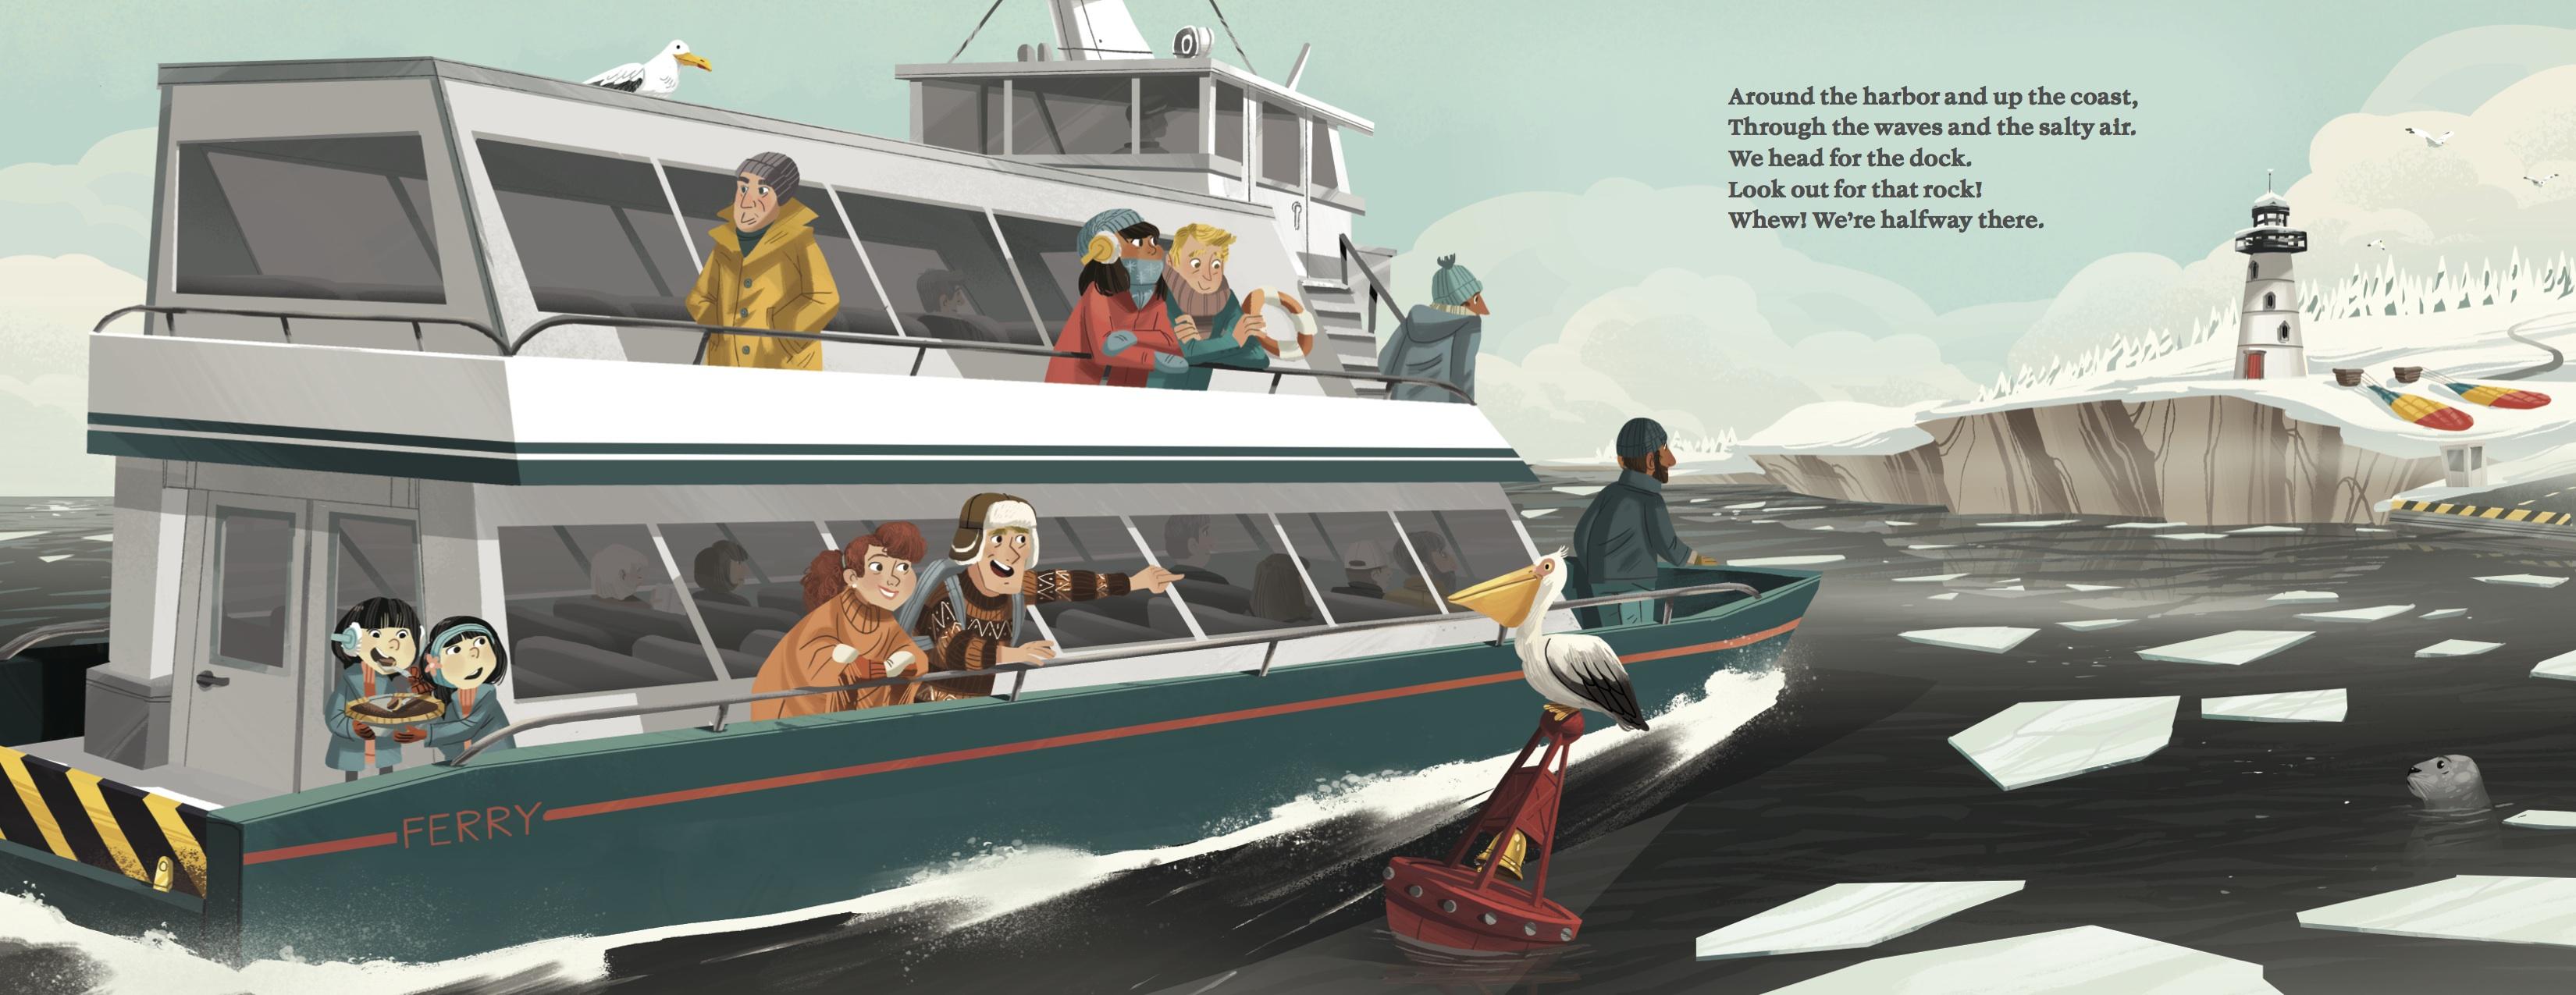 OTR ferry boat